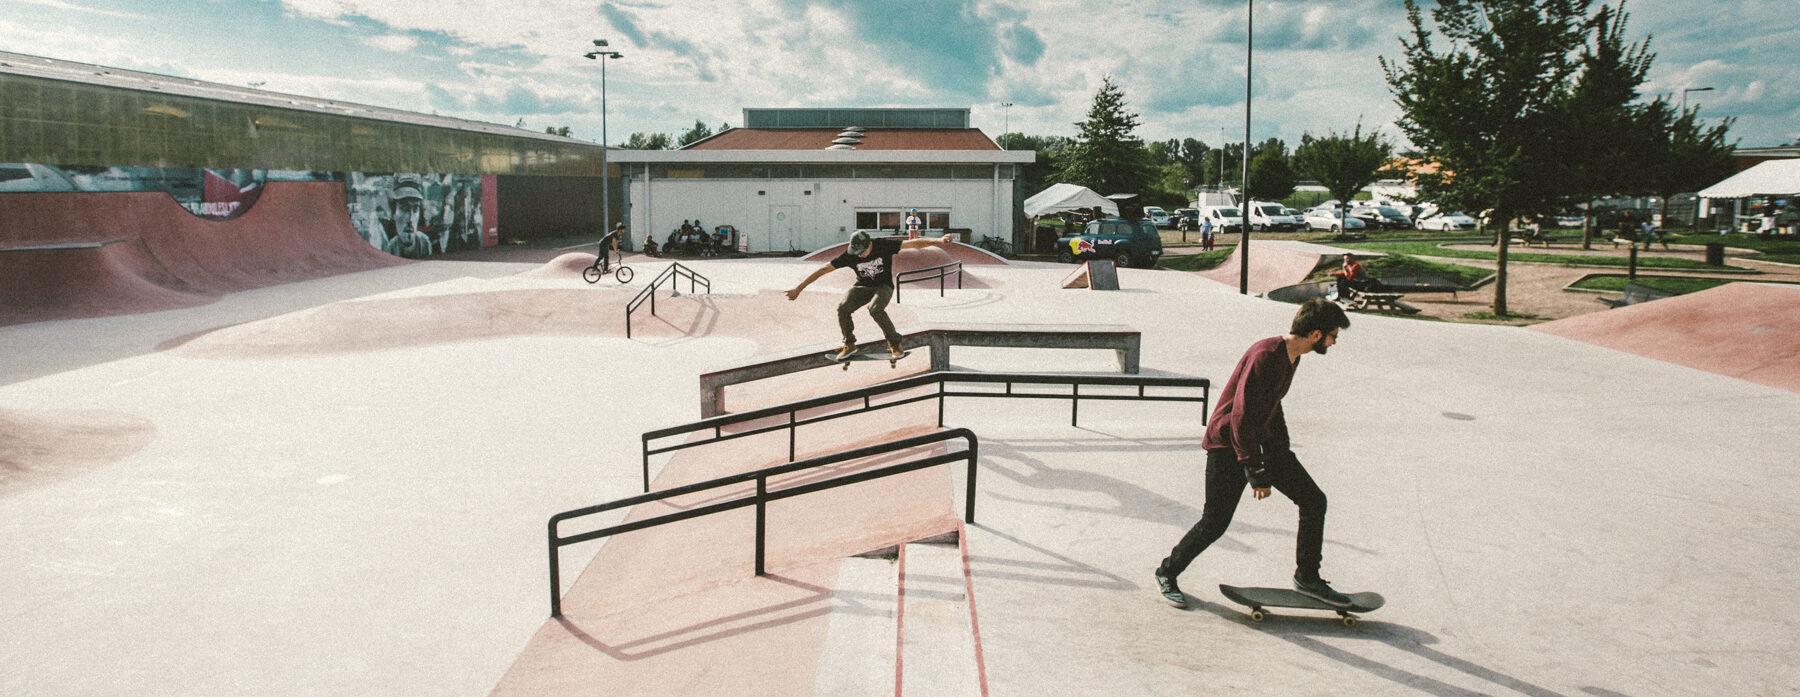 Skatepark outdoor